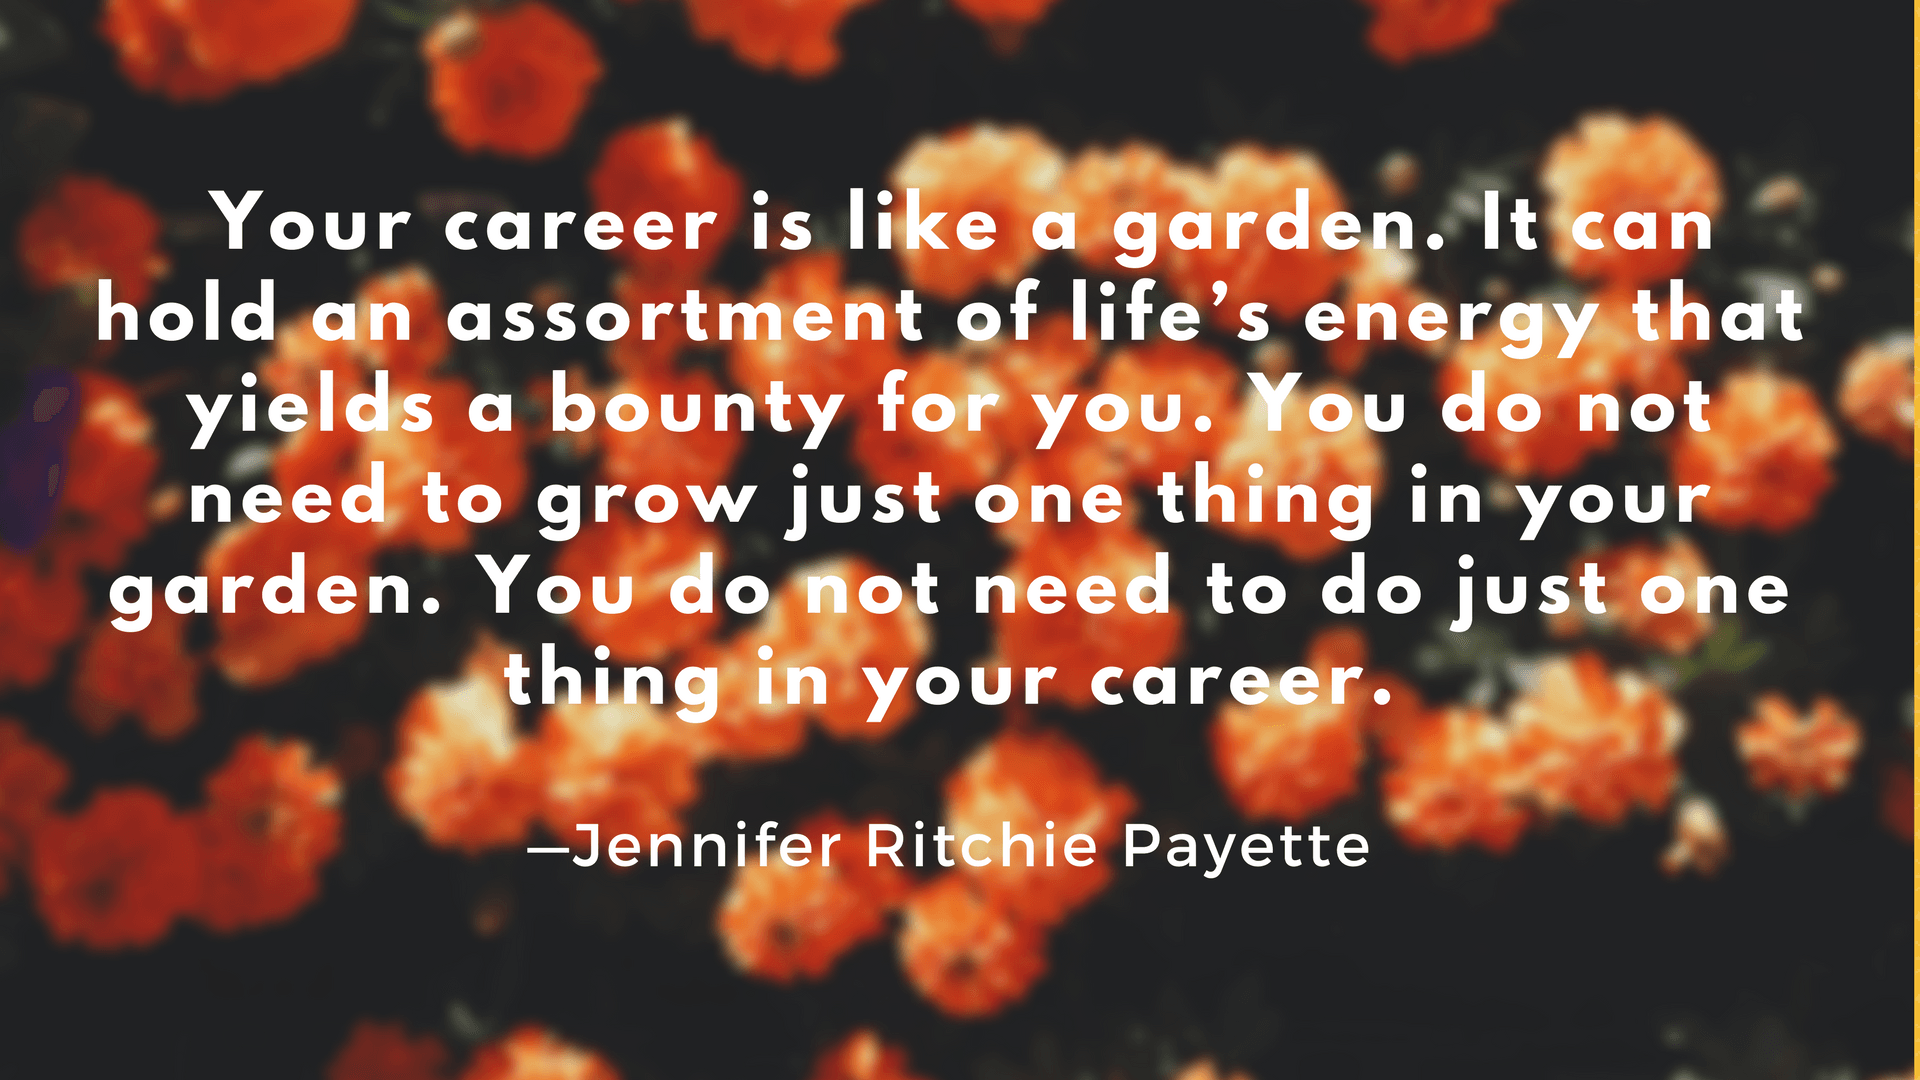 jennifer Ritchie Payette quote